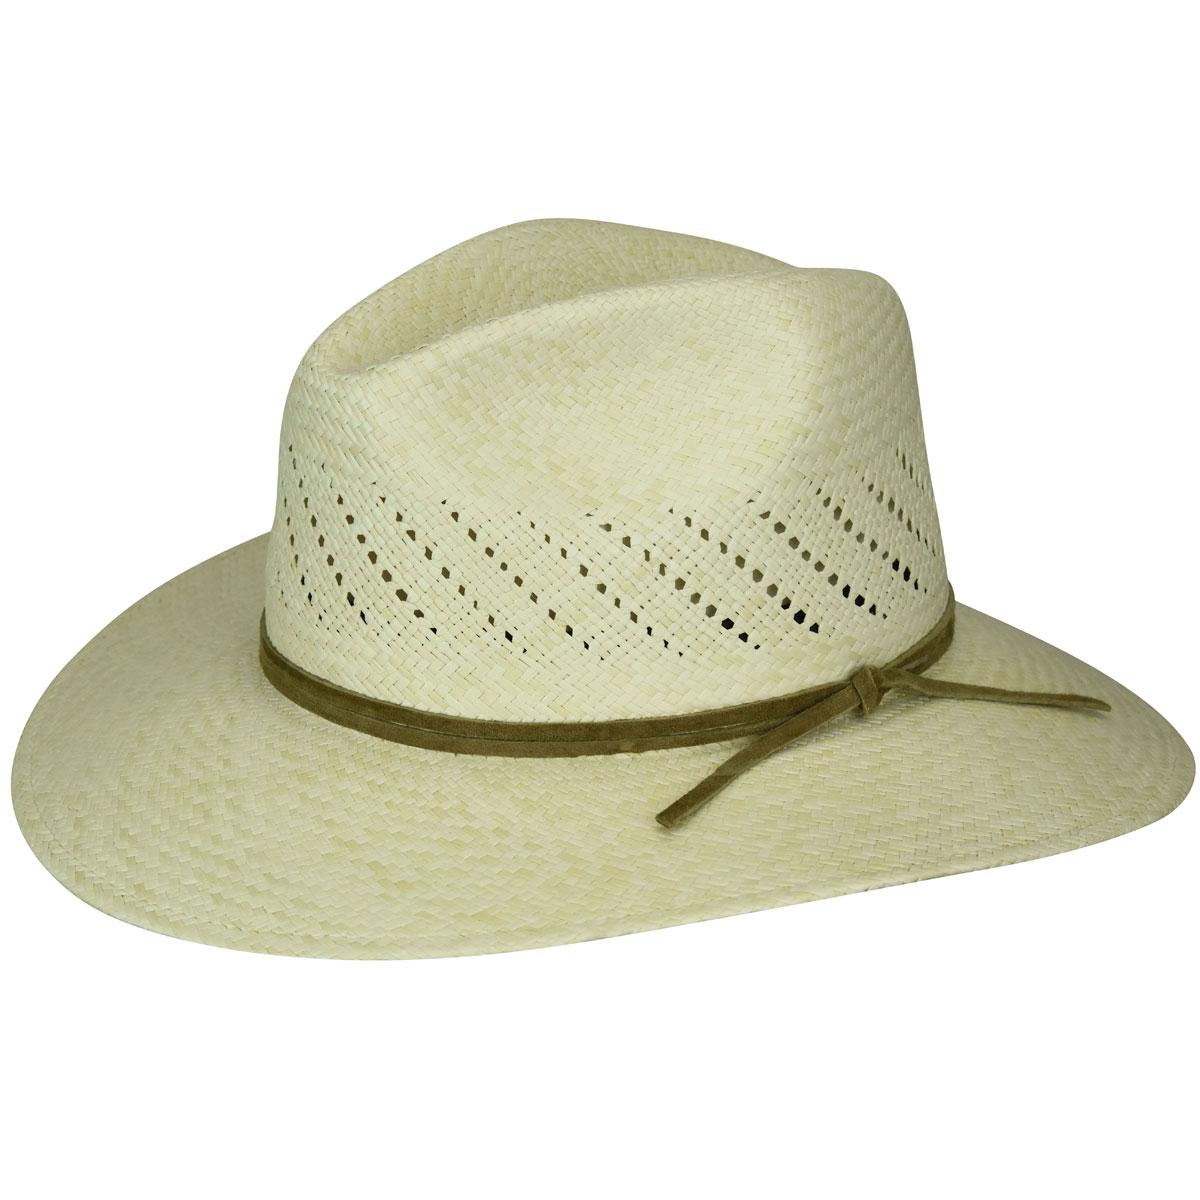 1950's Mens Hats Tucson Panama Straw Fedora $95.00 AT vintagedancer.com